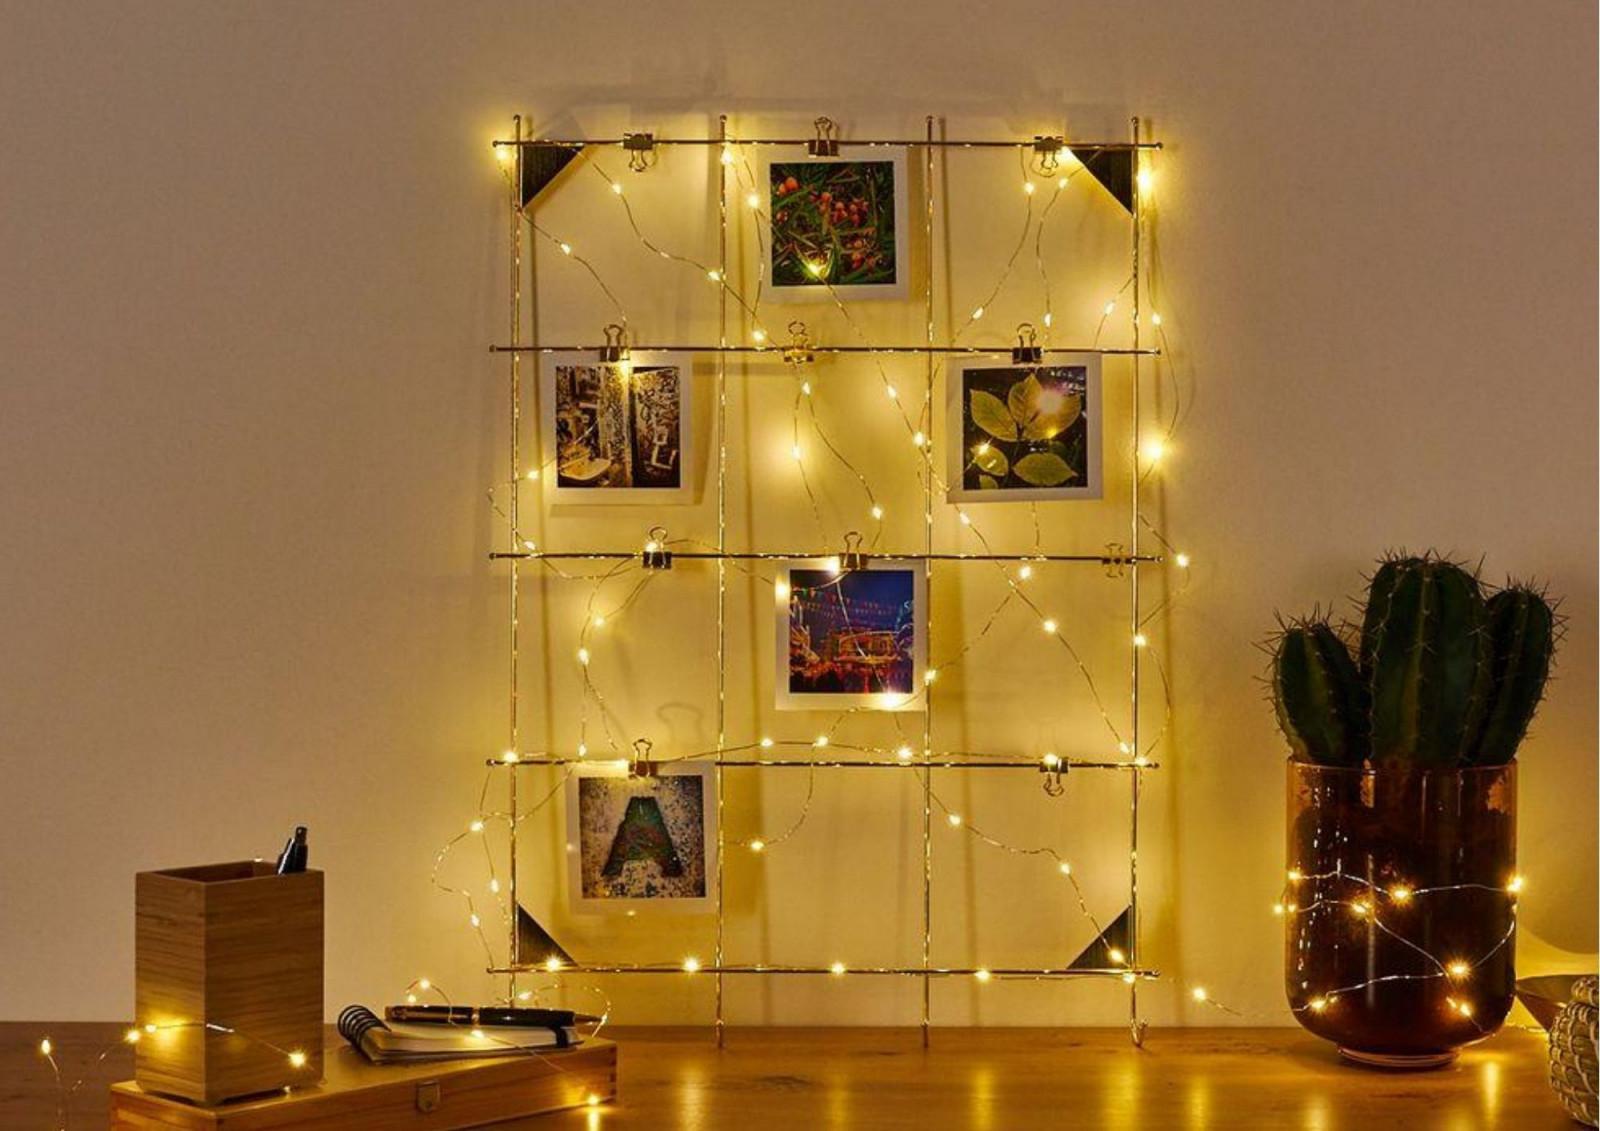 Lichterketten Deko Beleuchtungsideen Mit Lichterketten von Lichterkette Wohnzimmer Deko Bild